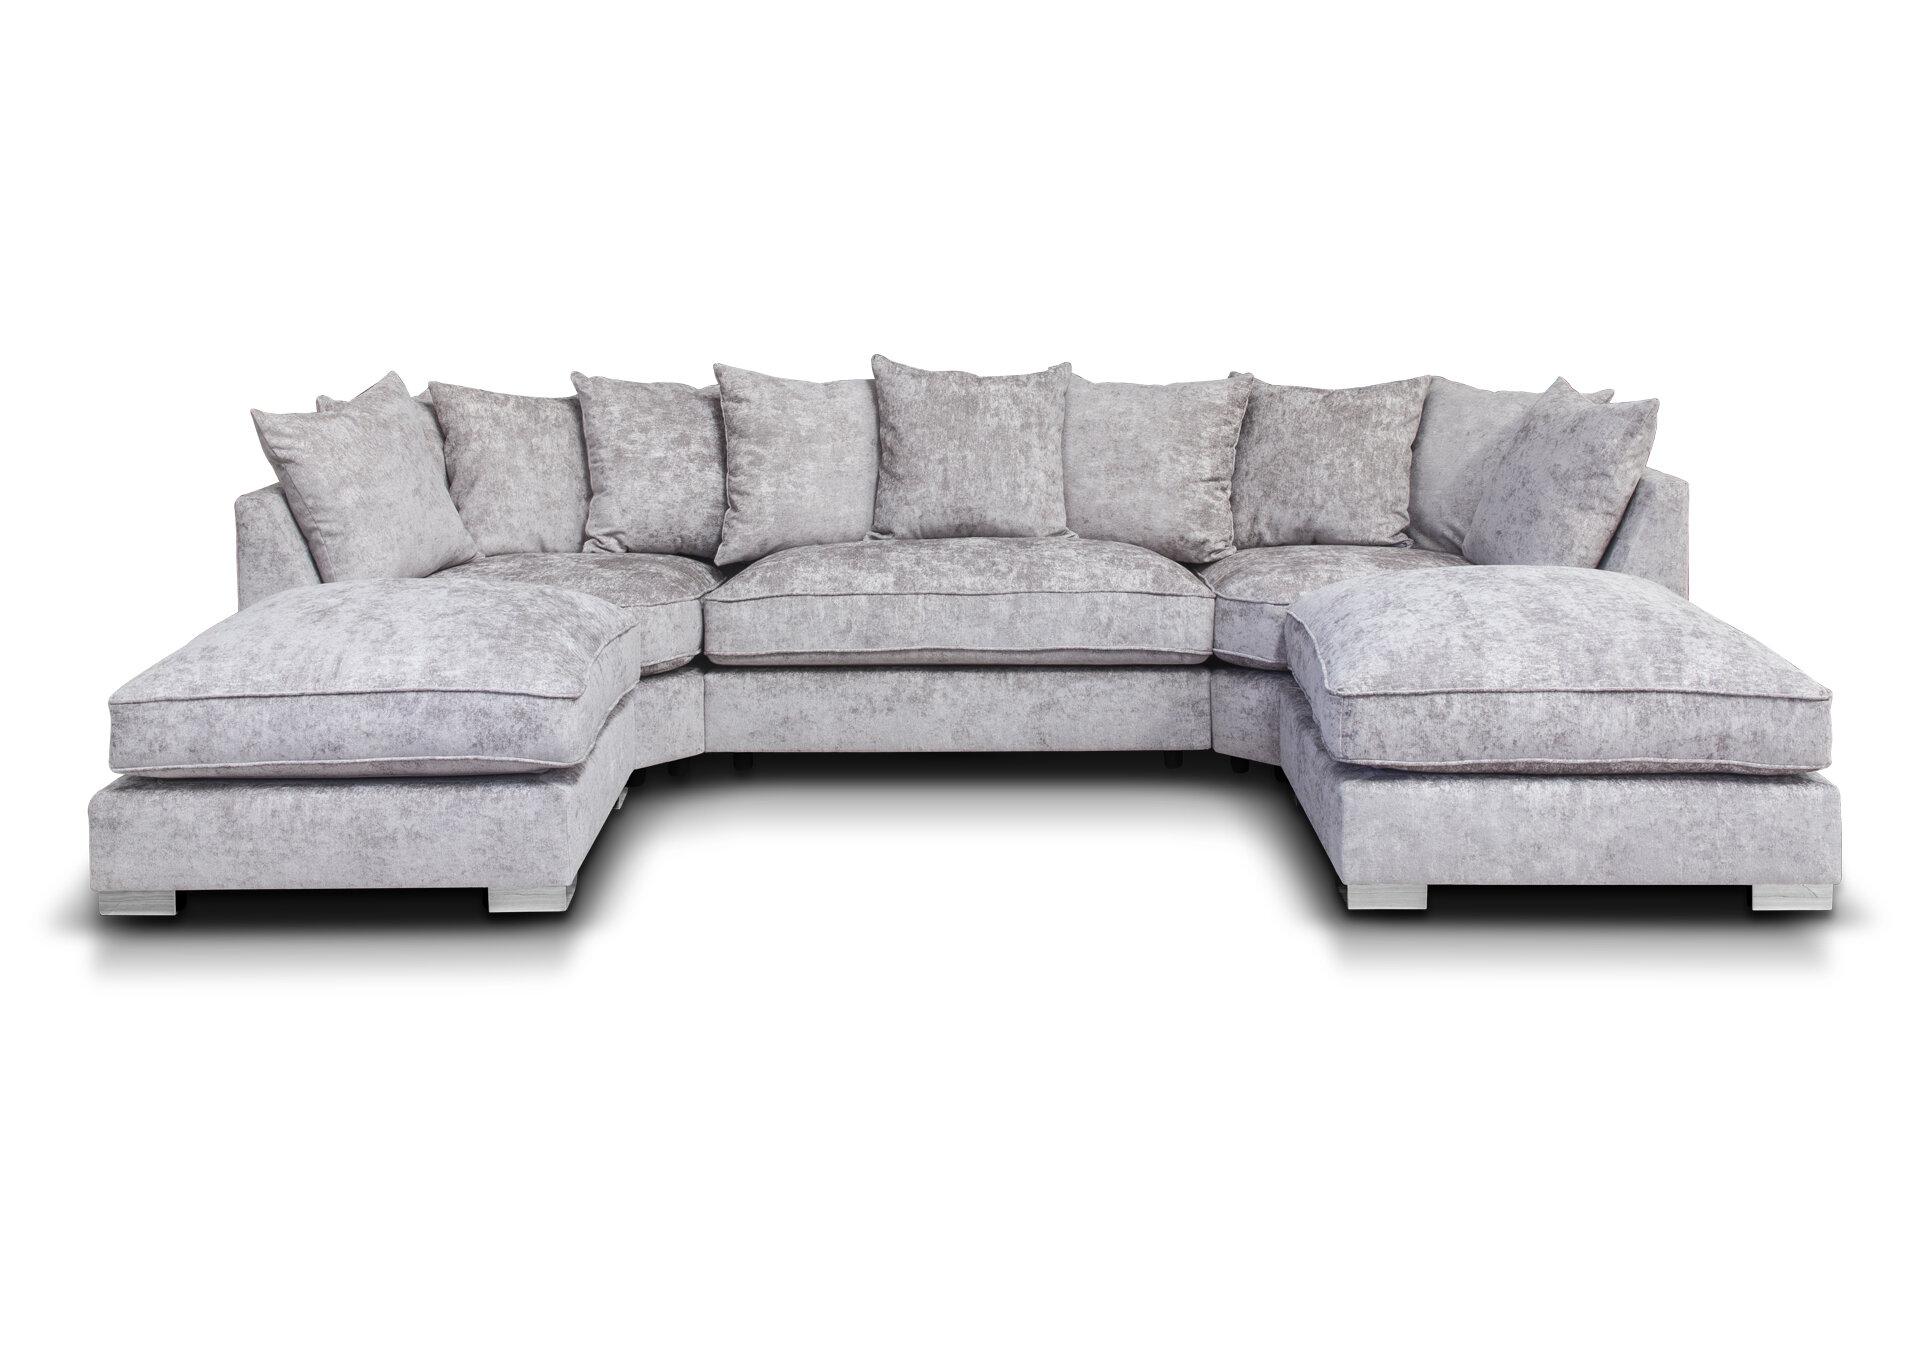 Harriet Fabric Sofa - Truffle 1